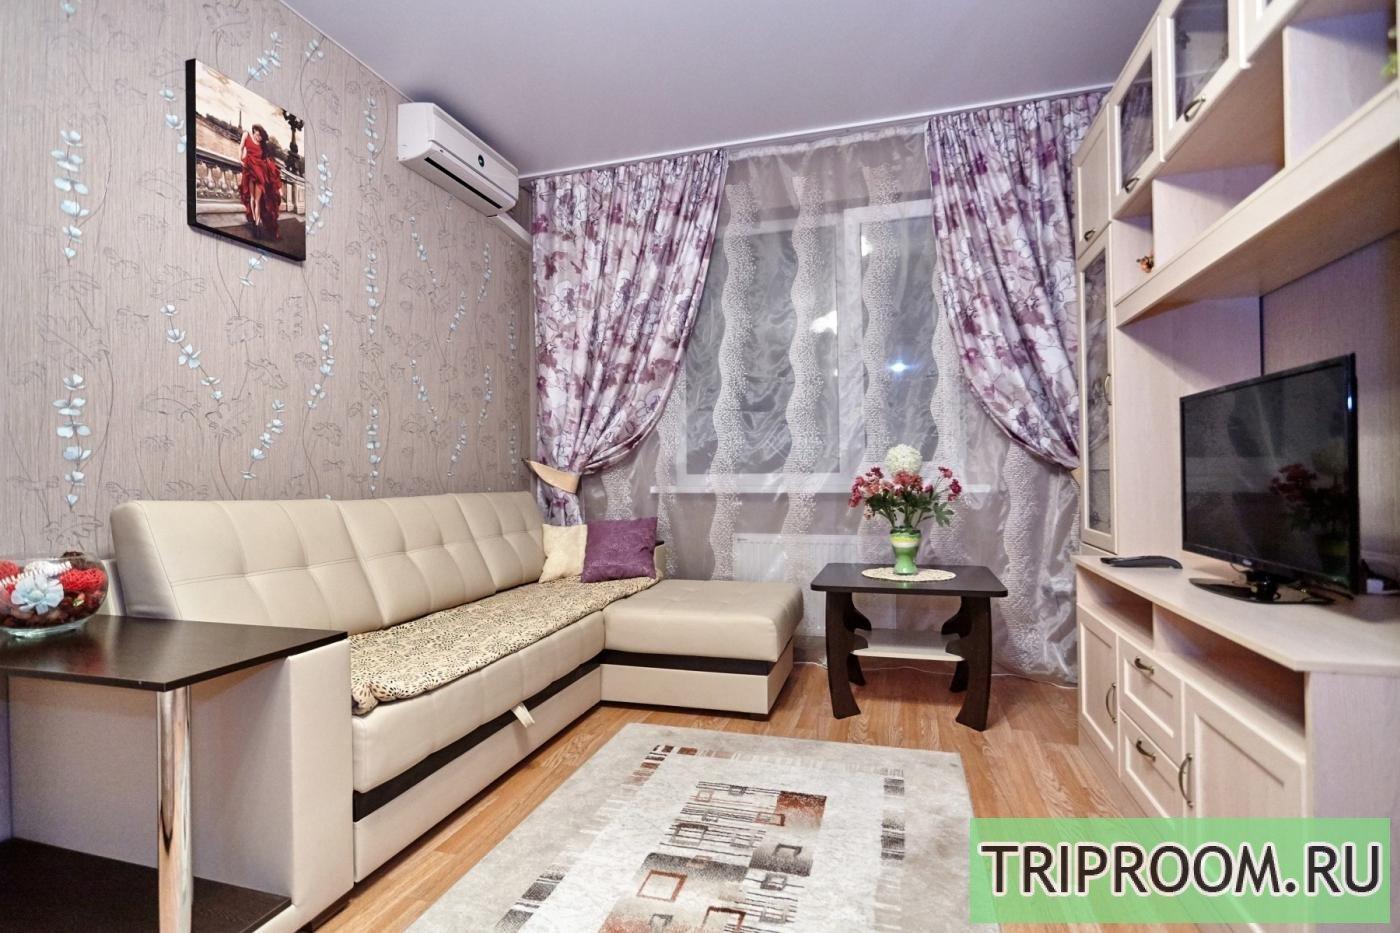 1-комнатная квартира посуточно (вариант № 6860), ул. Соколова улица, фото № 1